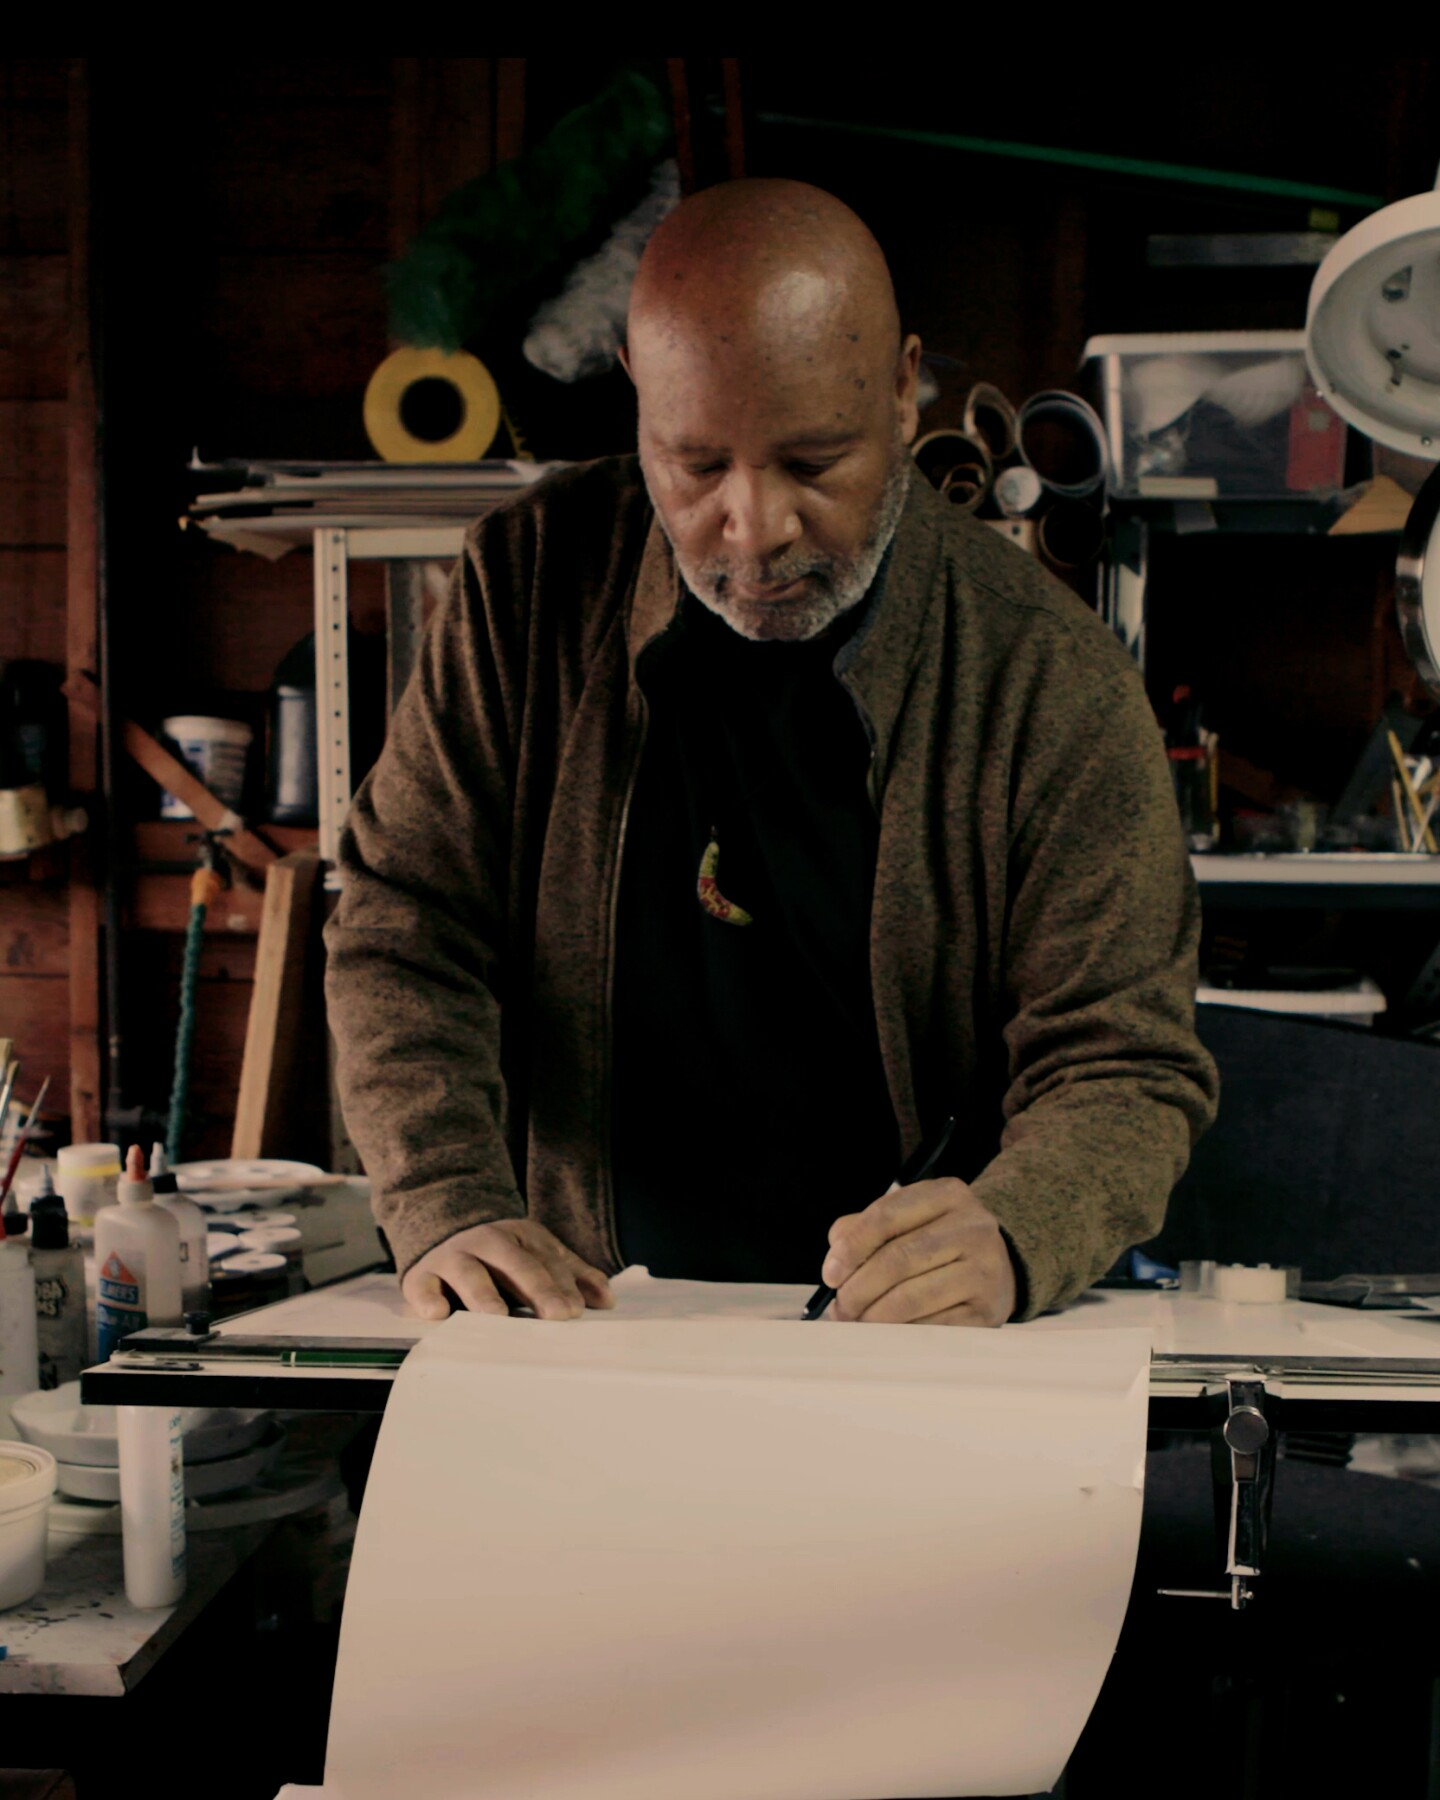 Graphic design Emory Douglas working in his studio.